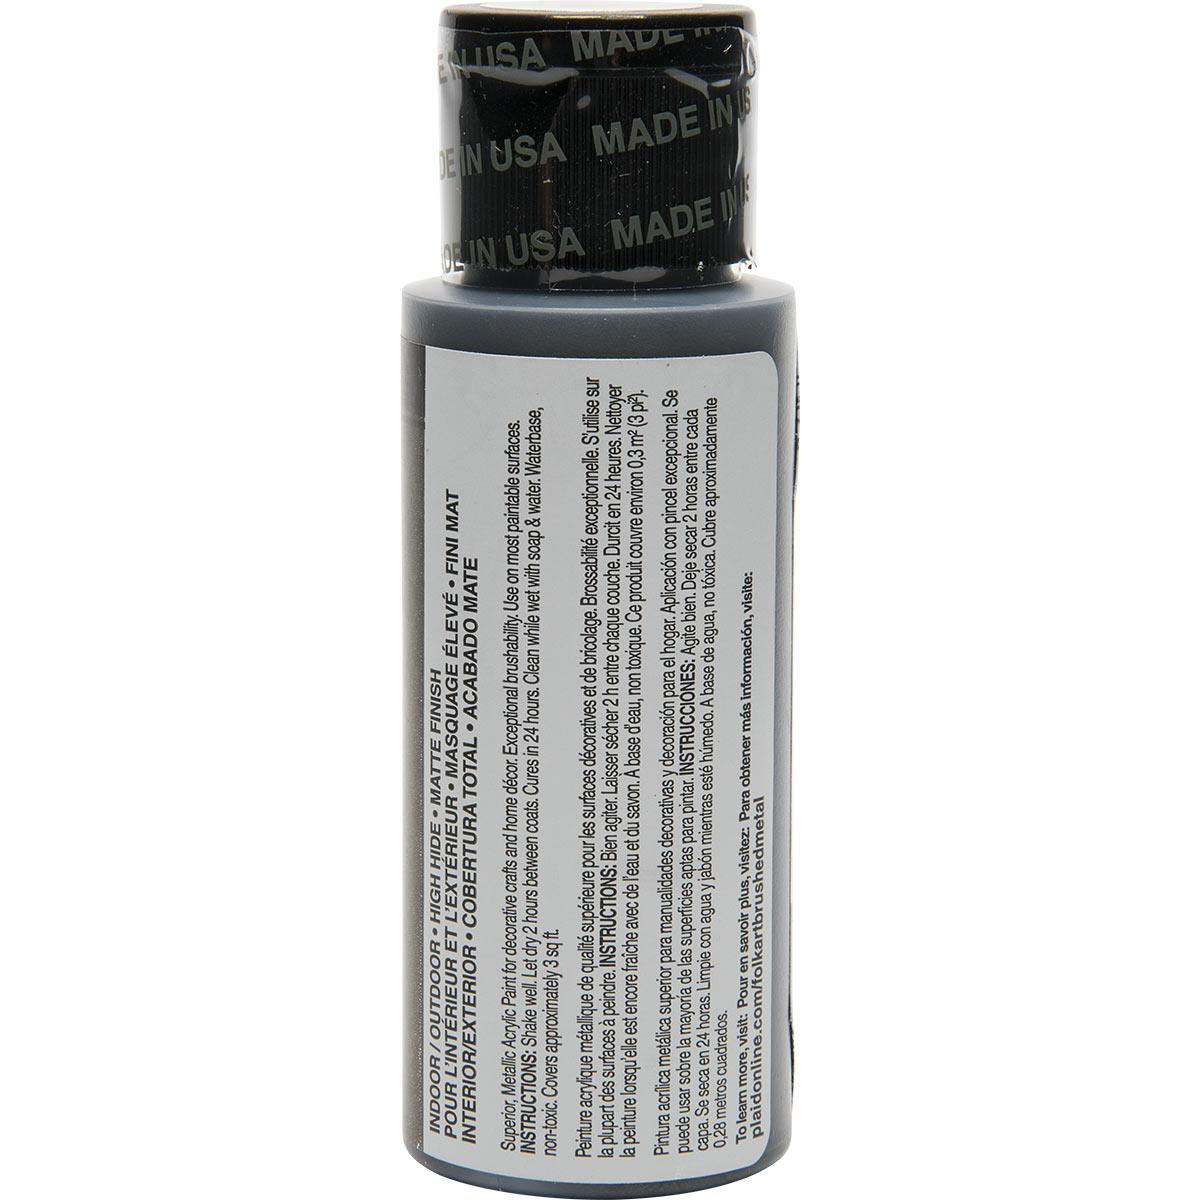 FolkArt ® Brushed Metal™ Acrylic Paint - Black, 2 oz. - 5166